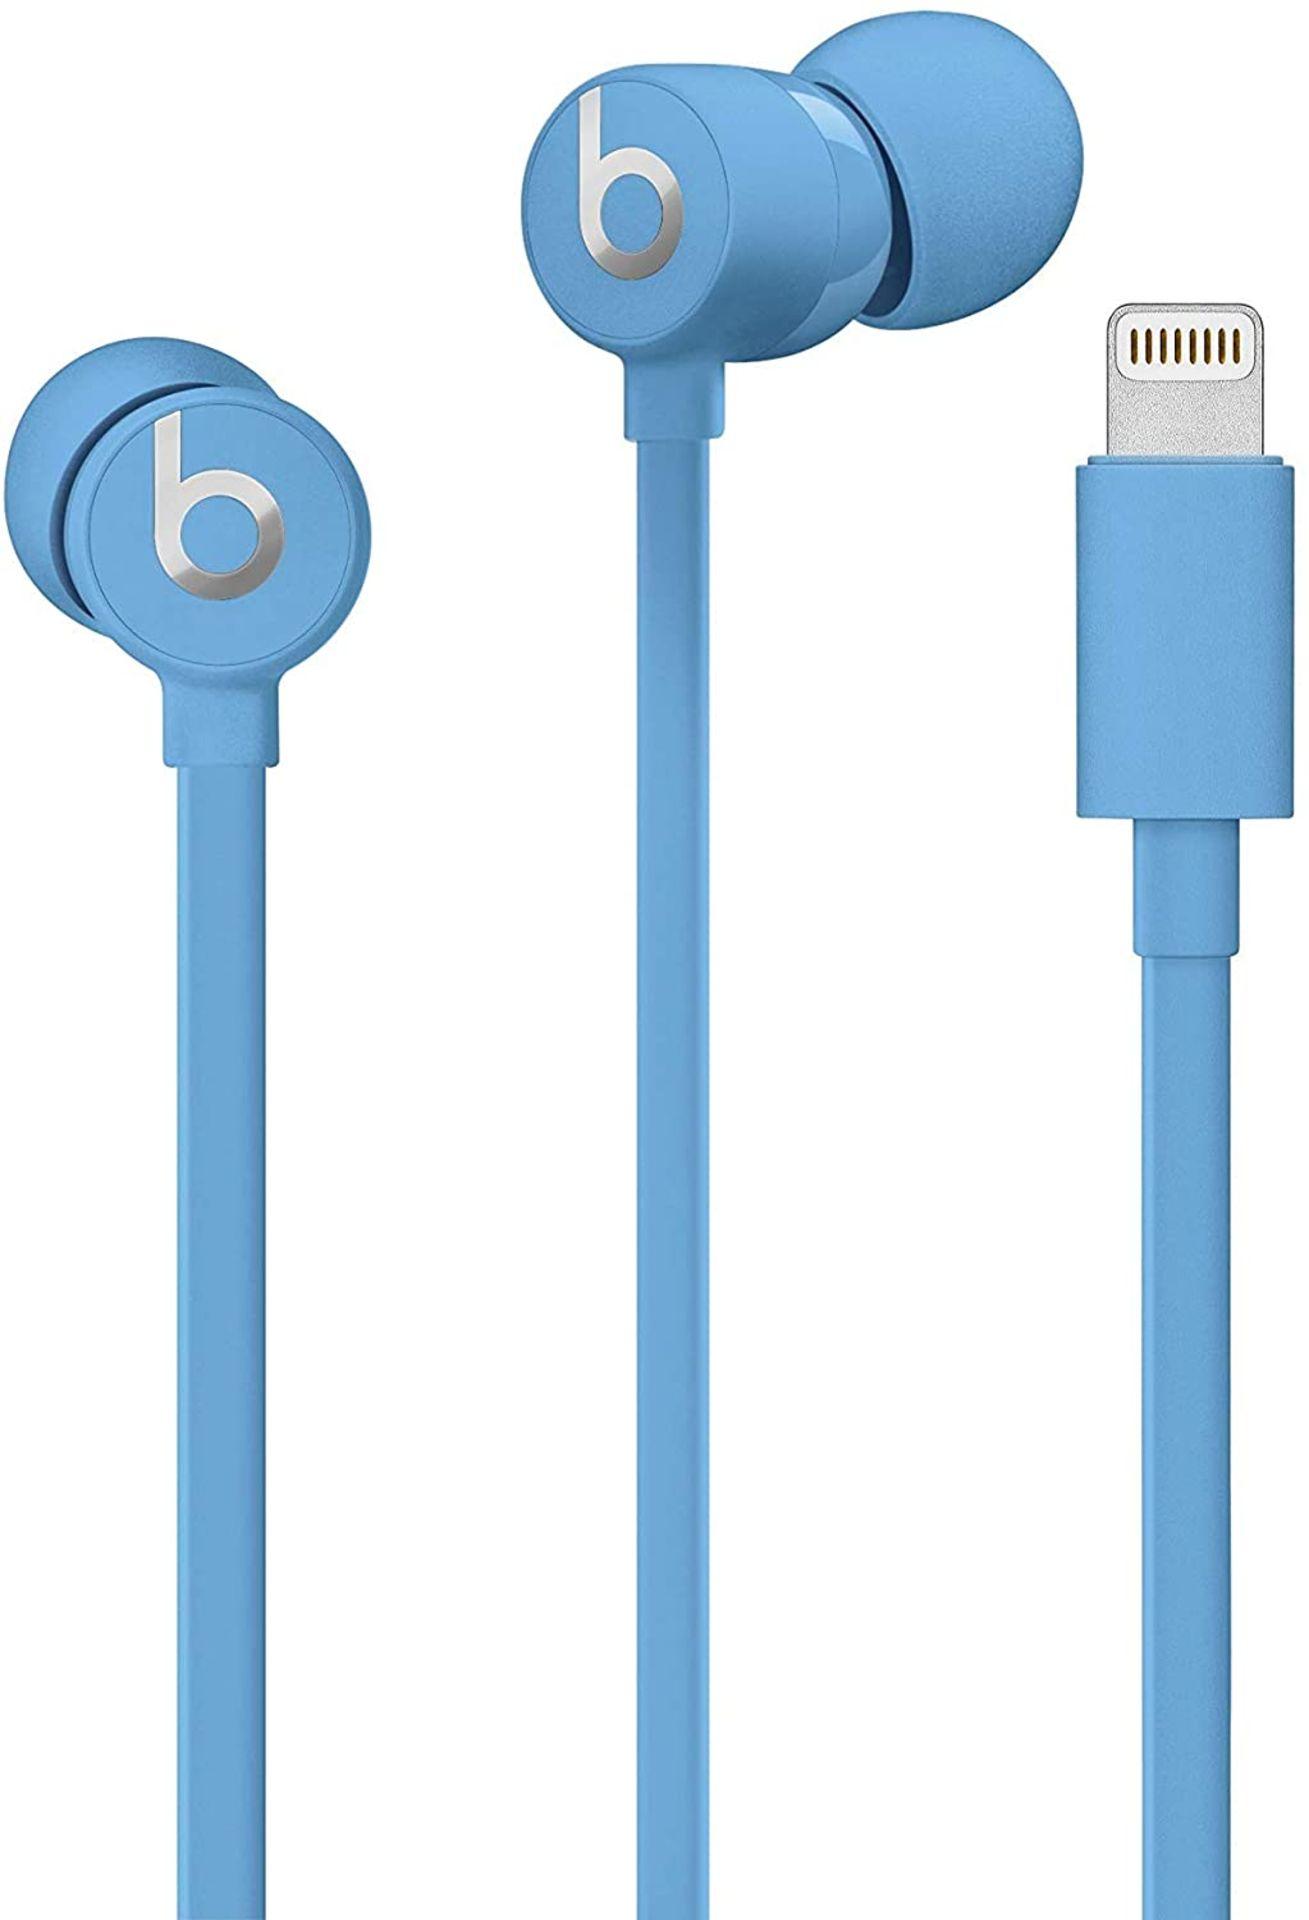 + VAT Brand New UrBeats 3 Earphones With Lightning Connector - Blue - Ergonomic Design - High